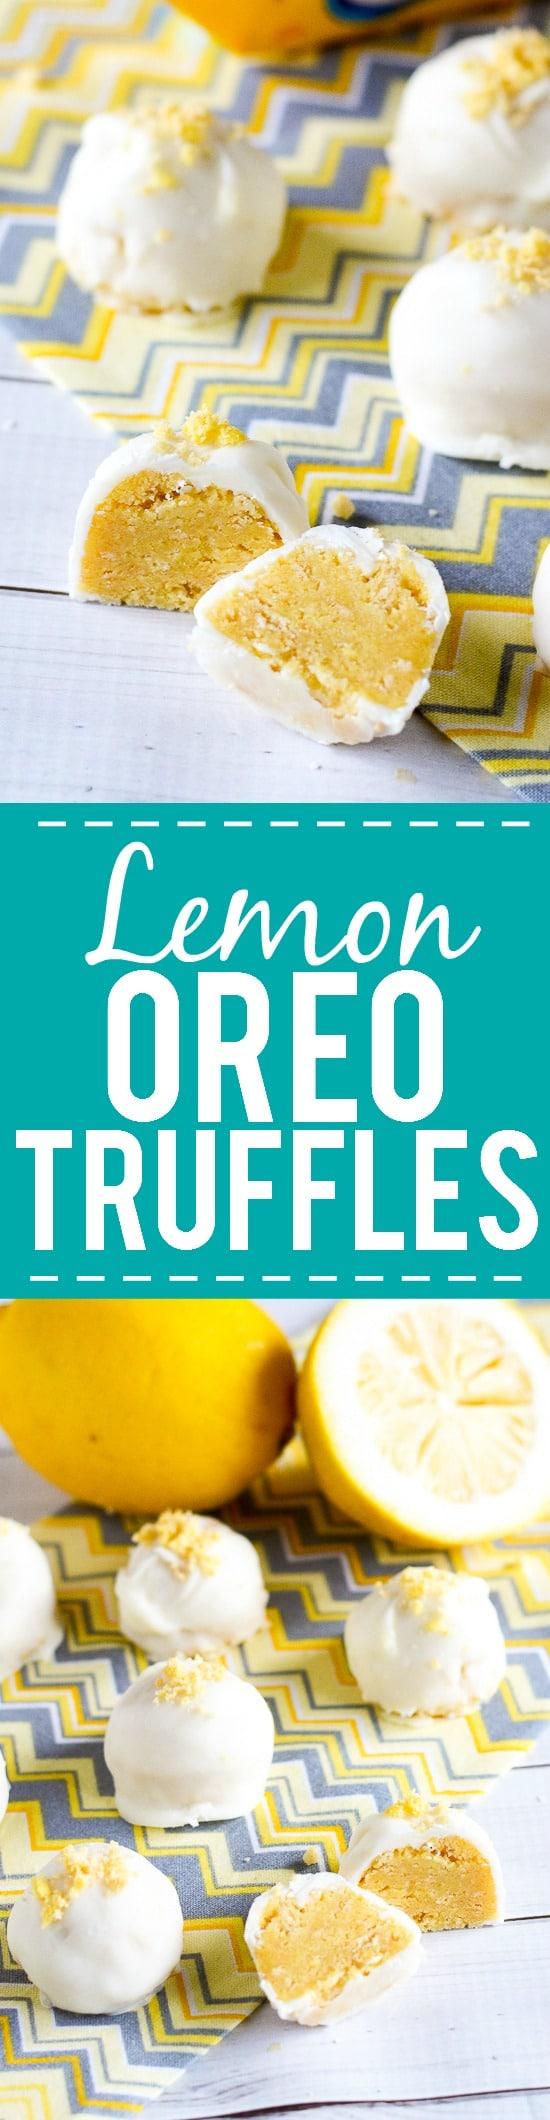 Lemon Oreo Truffles Recipe -Zesty and sweet Lemon Oreo Truffles covered in creamy white chocolate are a super easy dessert recipe that's no bake and a guaranteed hit! Easy no bake dessert recipe. Oreo truffles are the best!